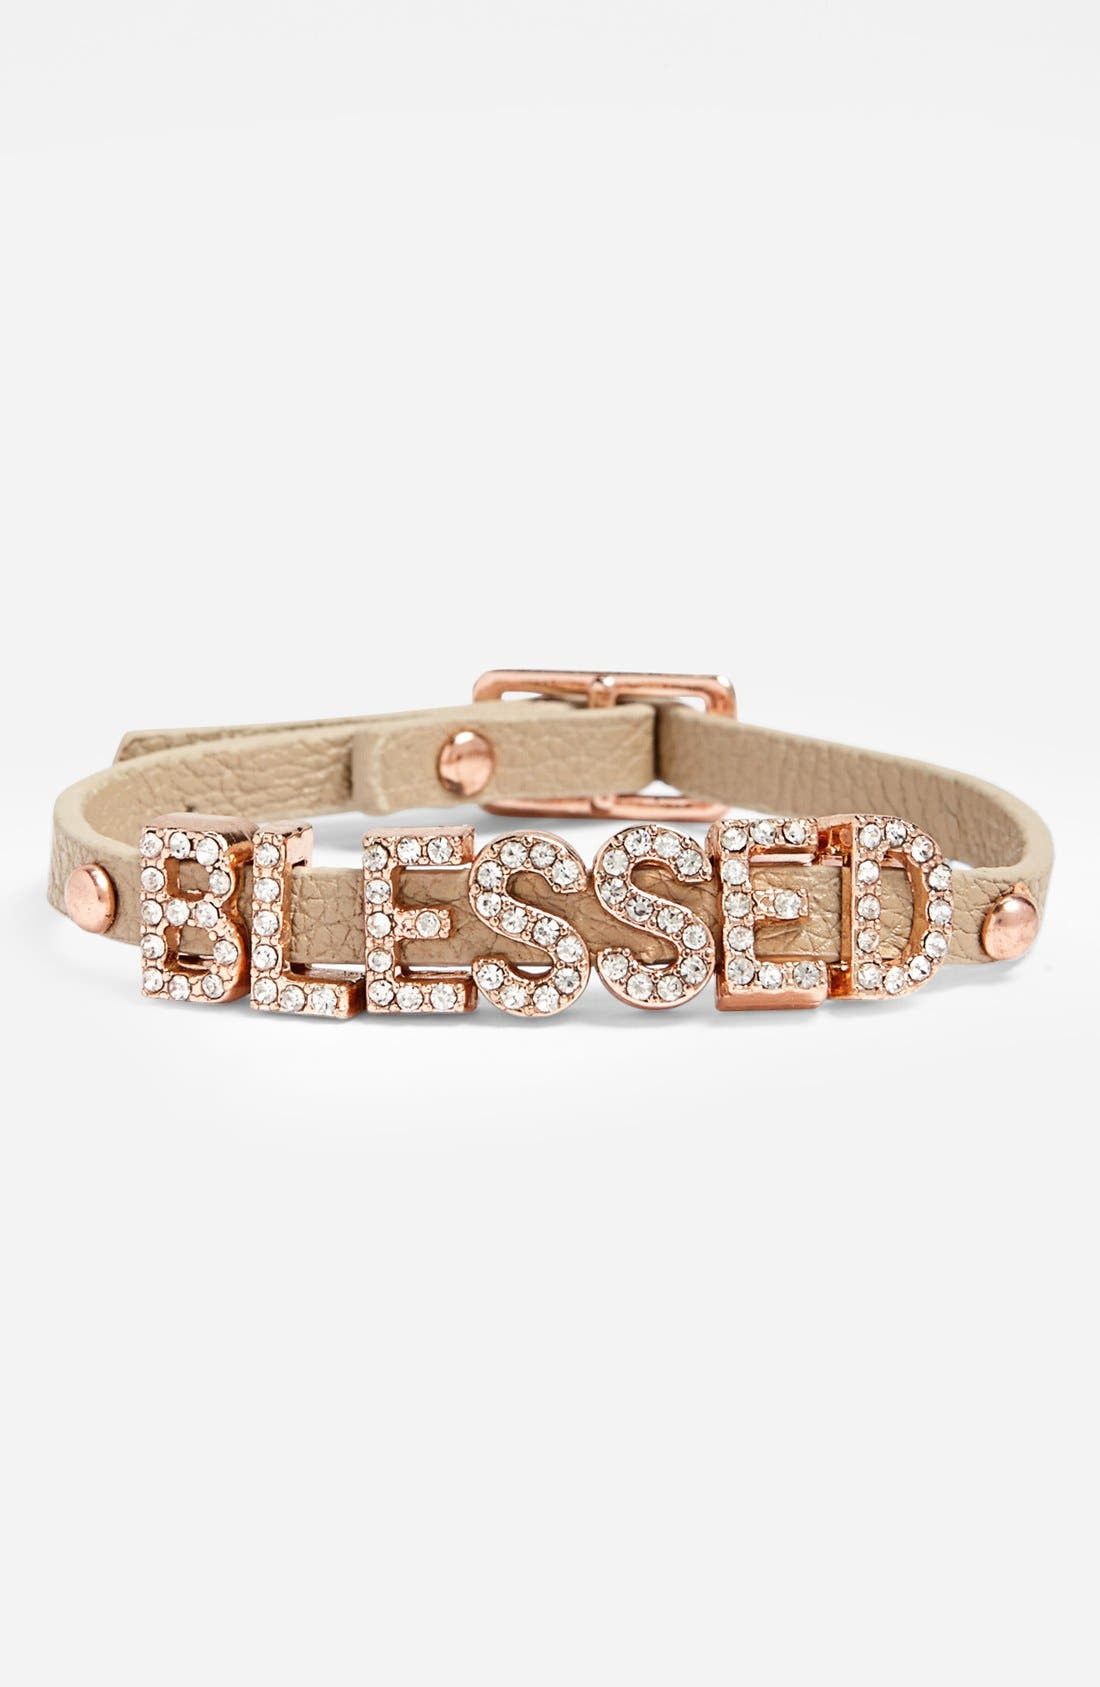 Alternate Image 1 Selected - BCBGeneration 'Sparkly Blessed' Bracelet